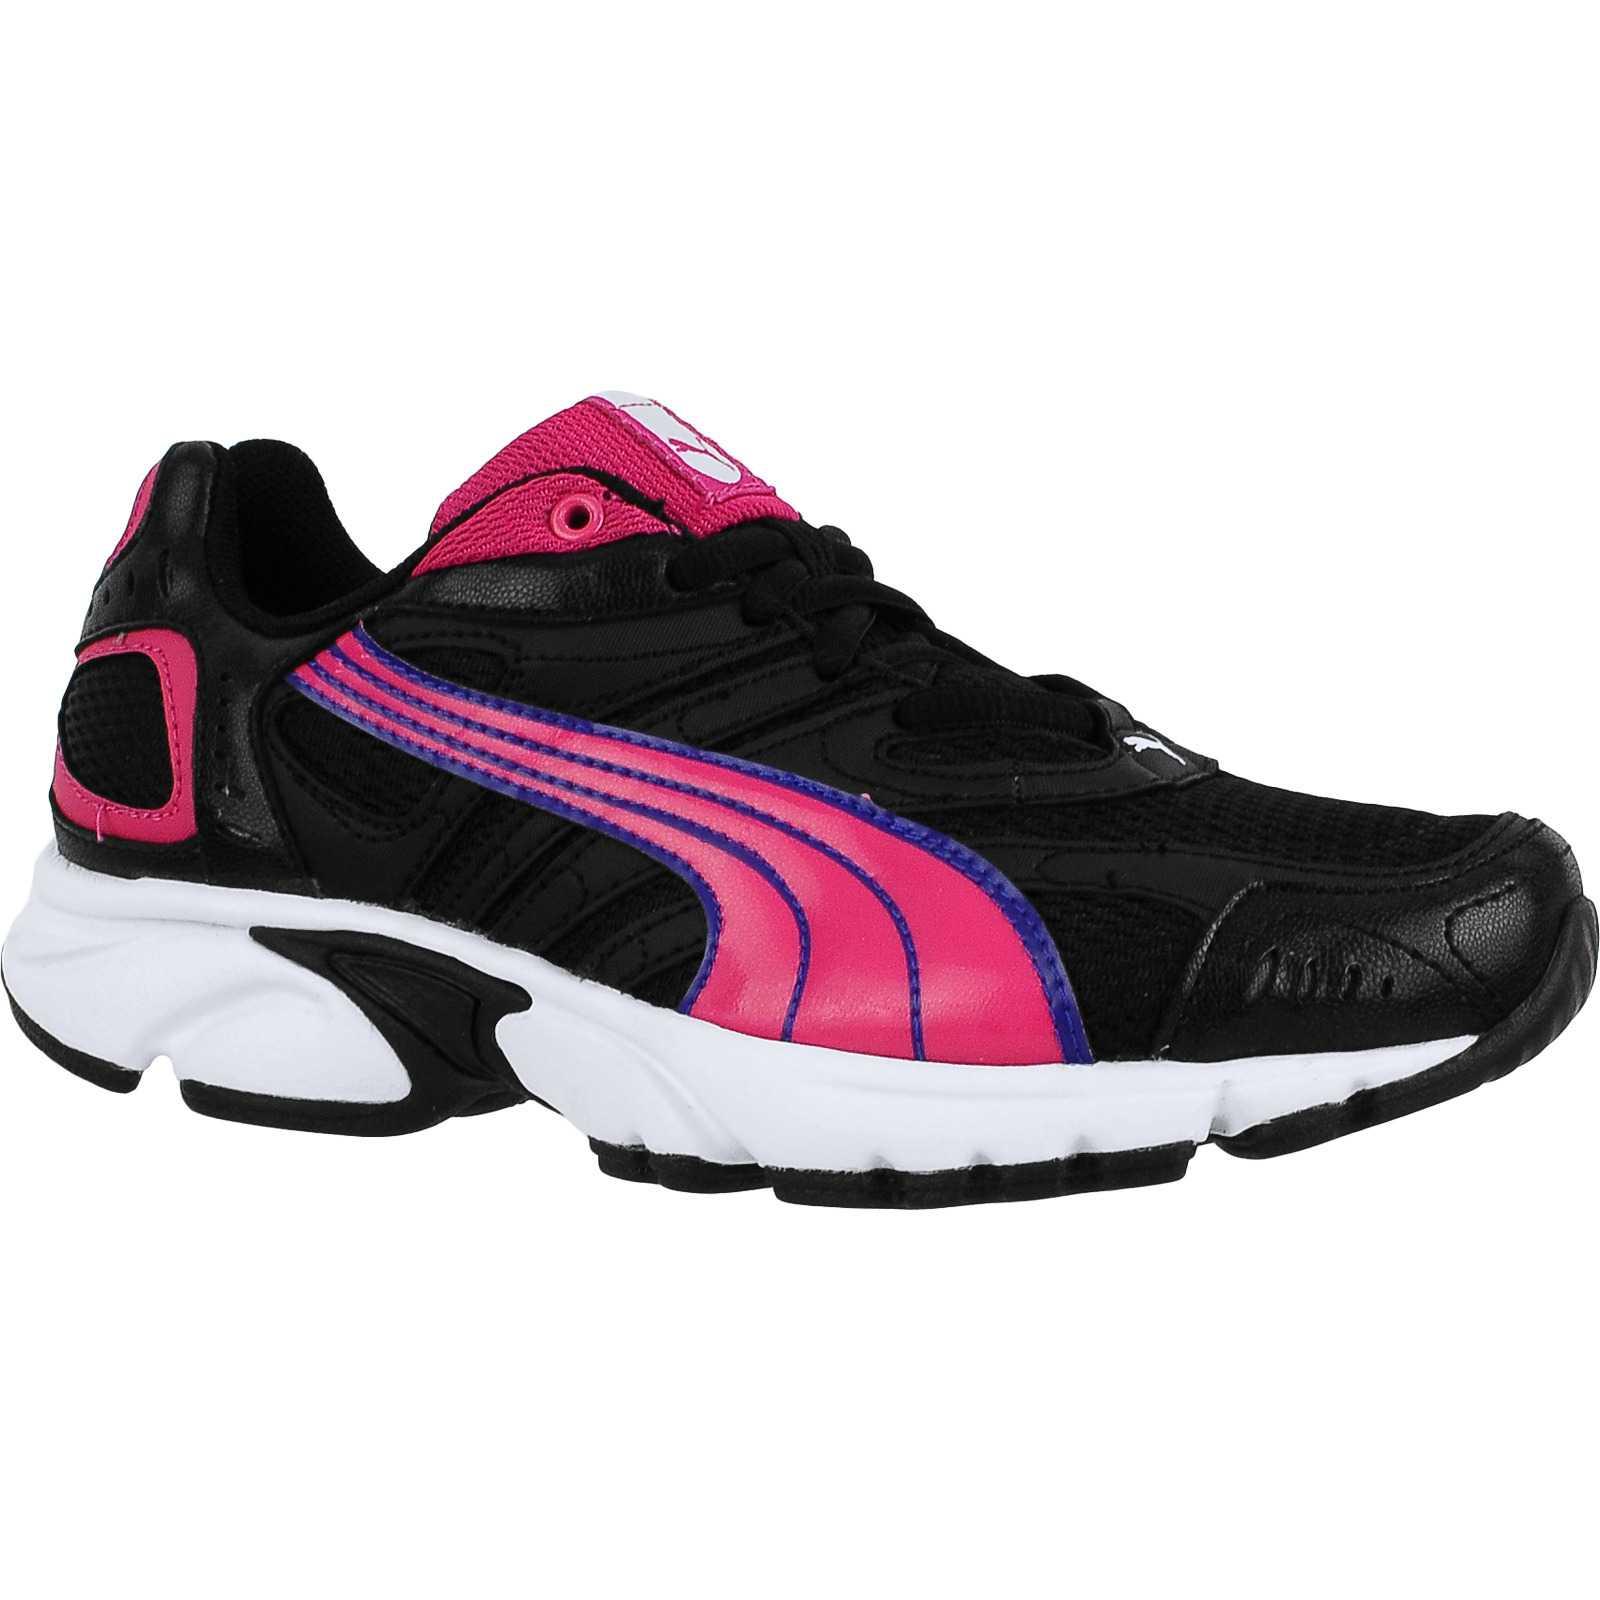 Pantofi sport femei Puma Xenon Wn s 18569721